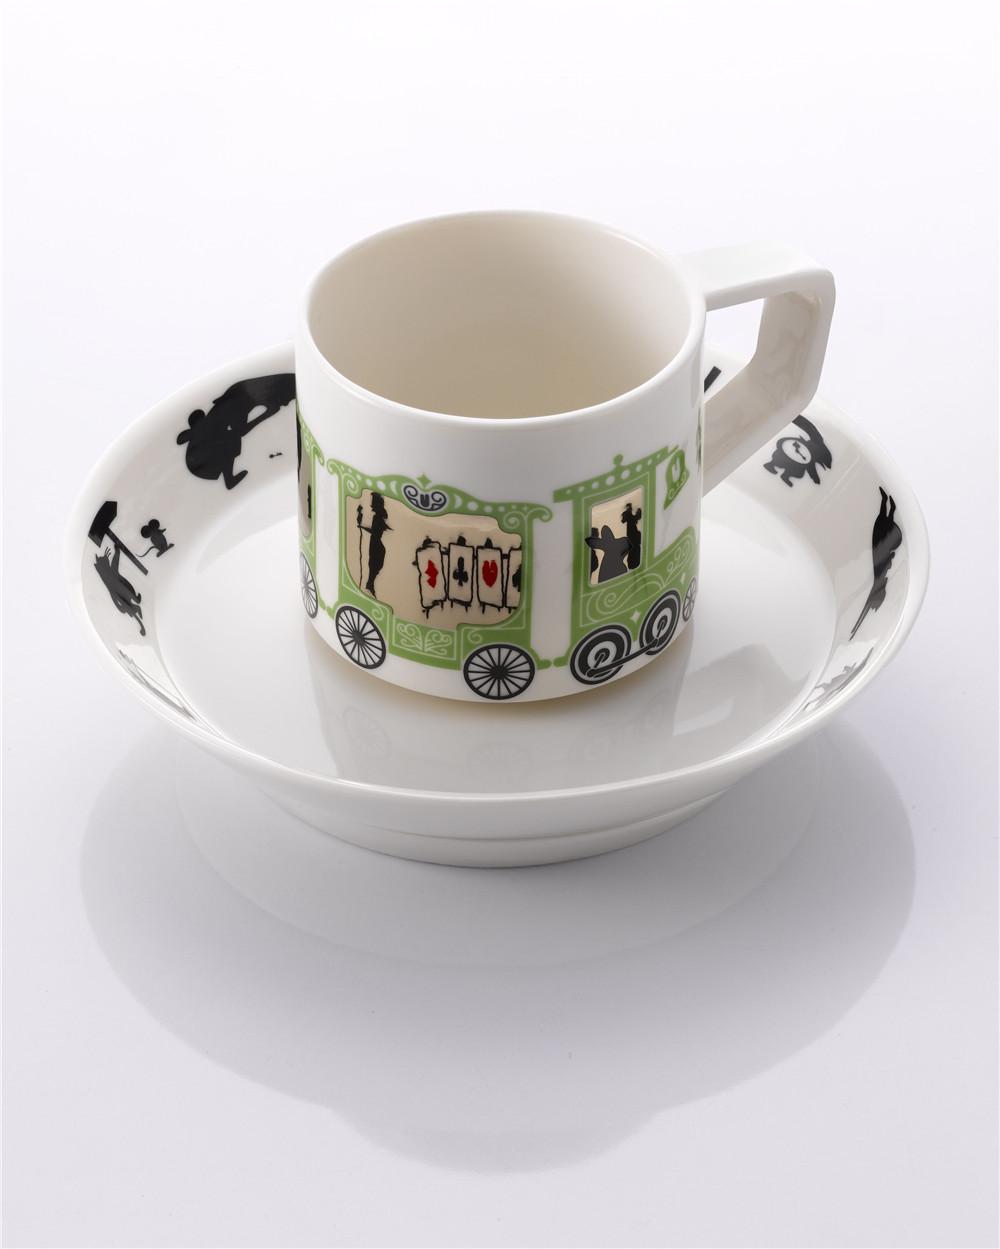 round-round-land-caffee-cup-hisheji (1)